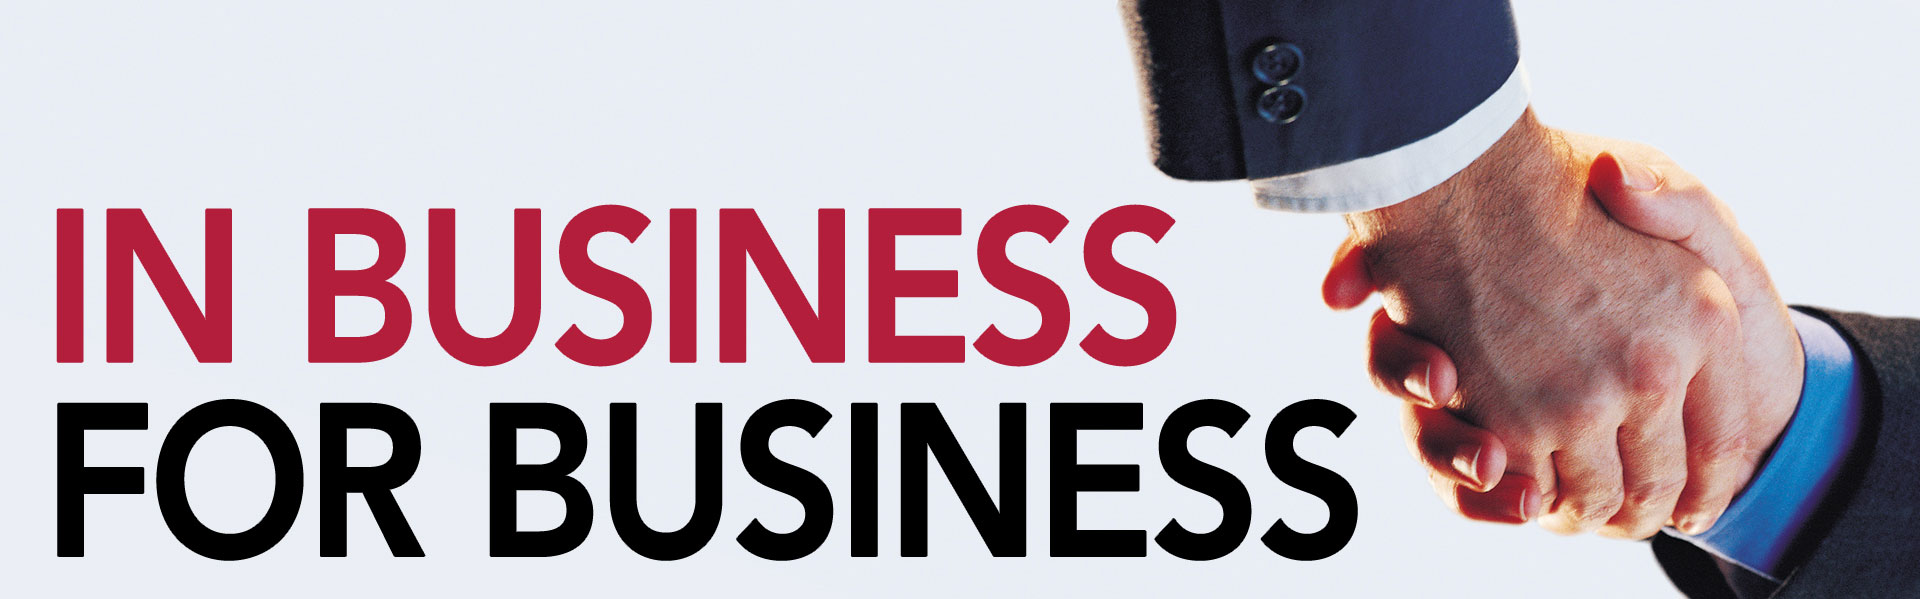 IBC Bank Business Lending